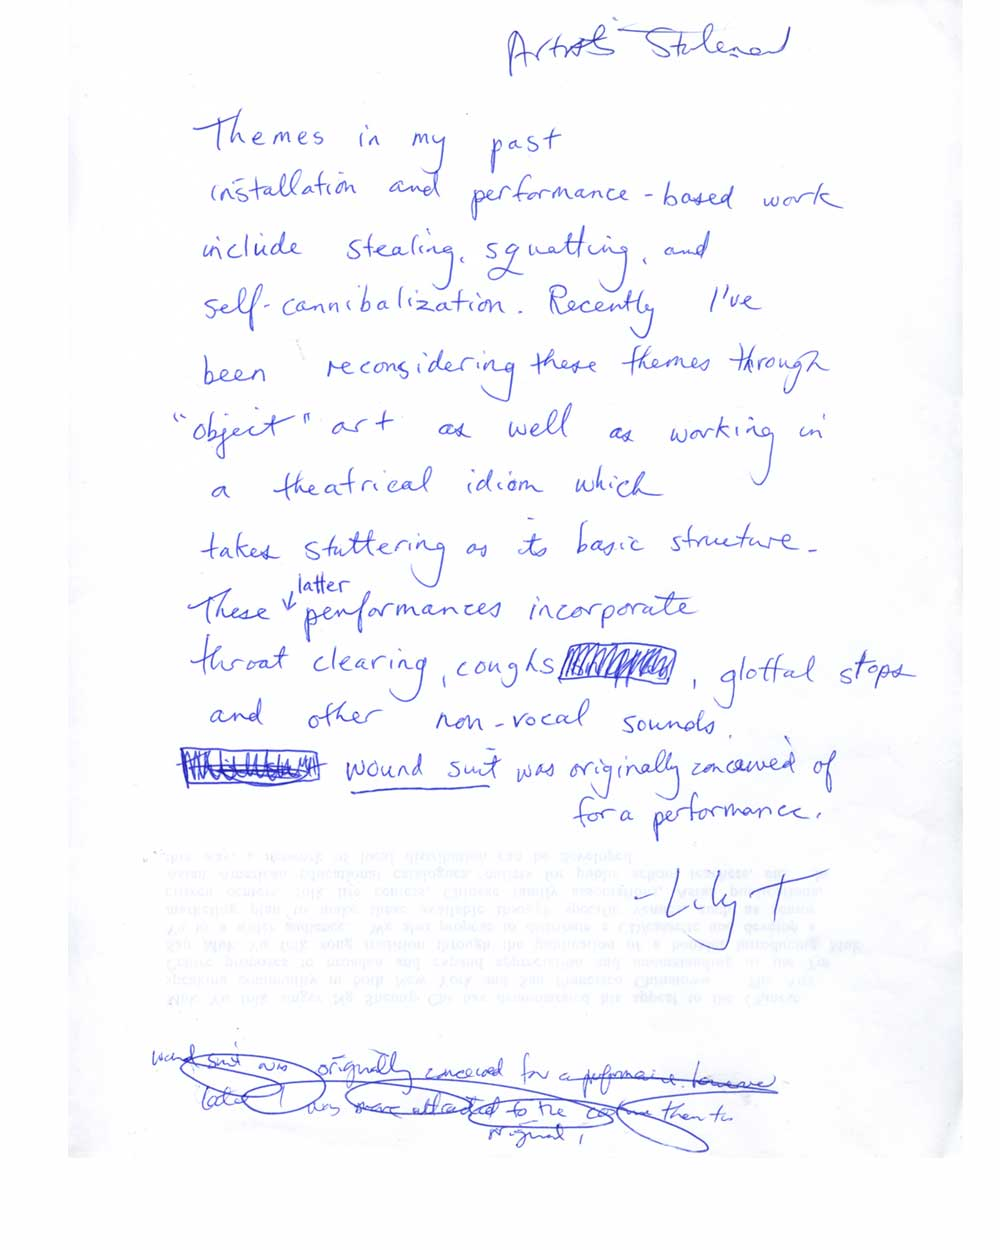 Lily Tsong's Artist Statement, hand written